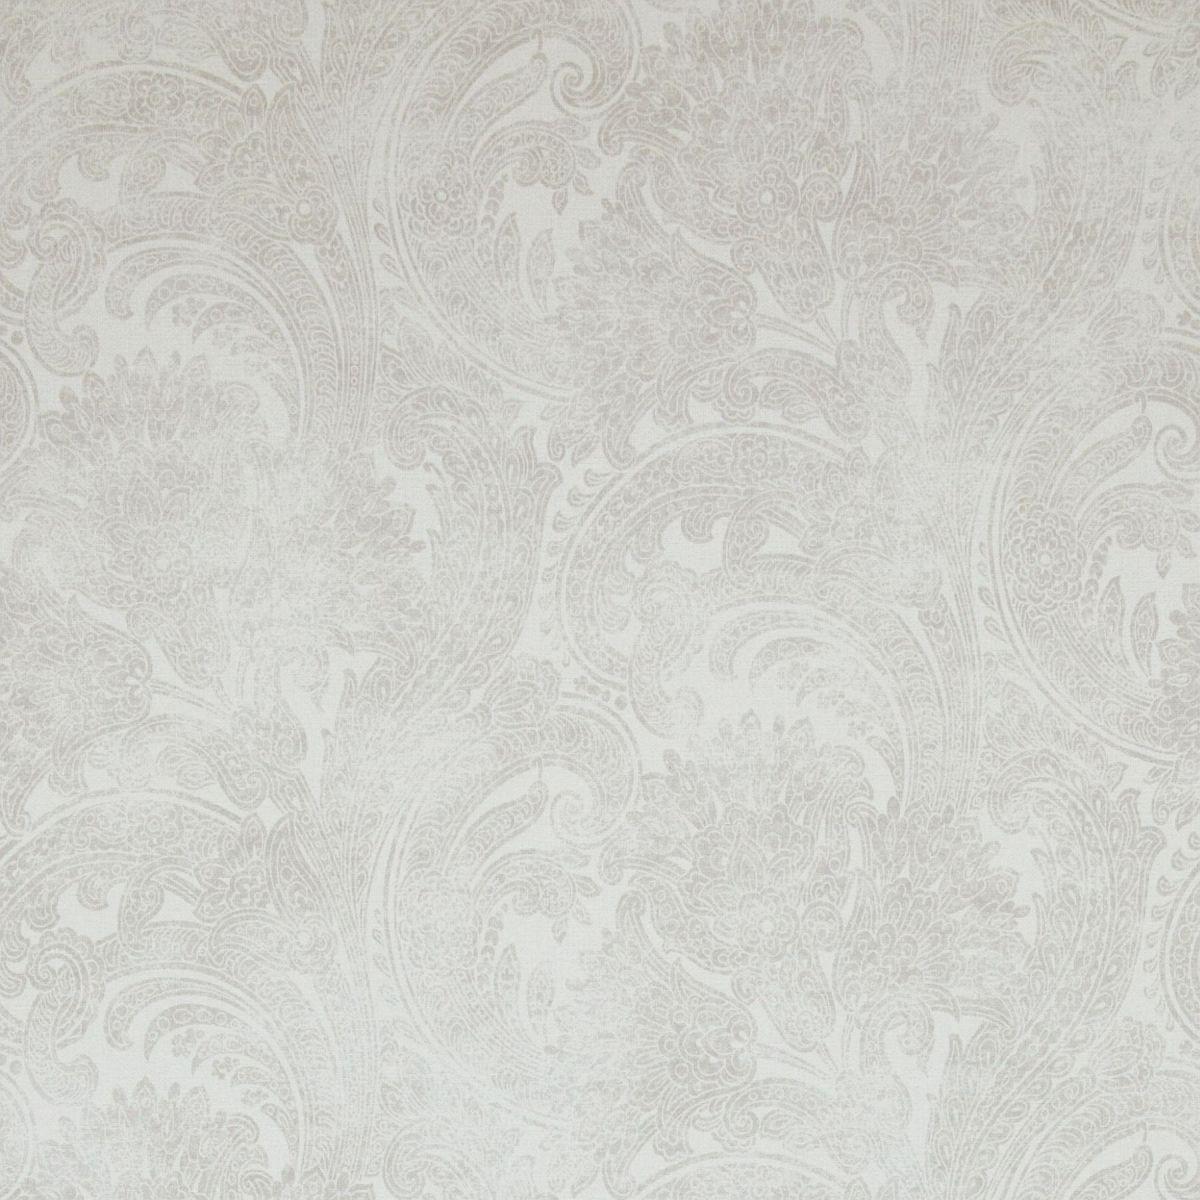 hochwertige tapeten und stoffe b n wallcoverings vliestapete riviera maison 18383 decowunder. Black Bedroom Furniture Sets. Home Design Ideas